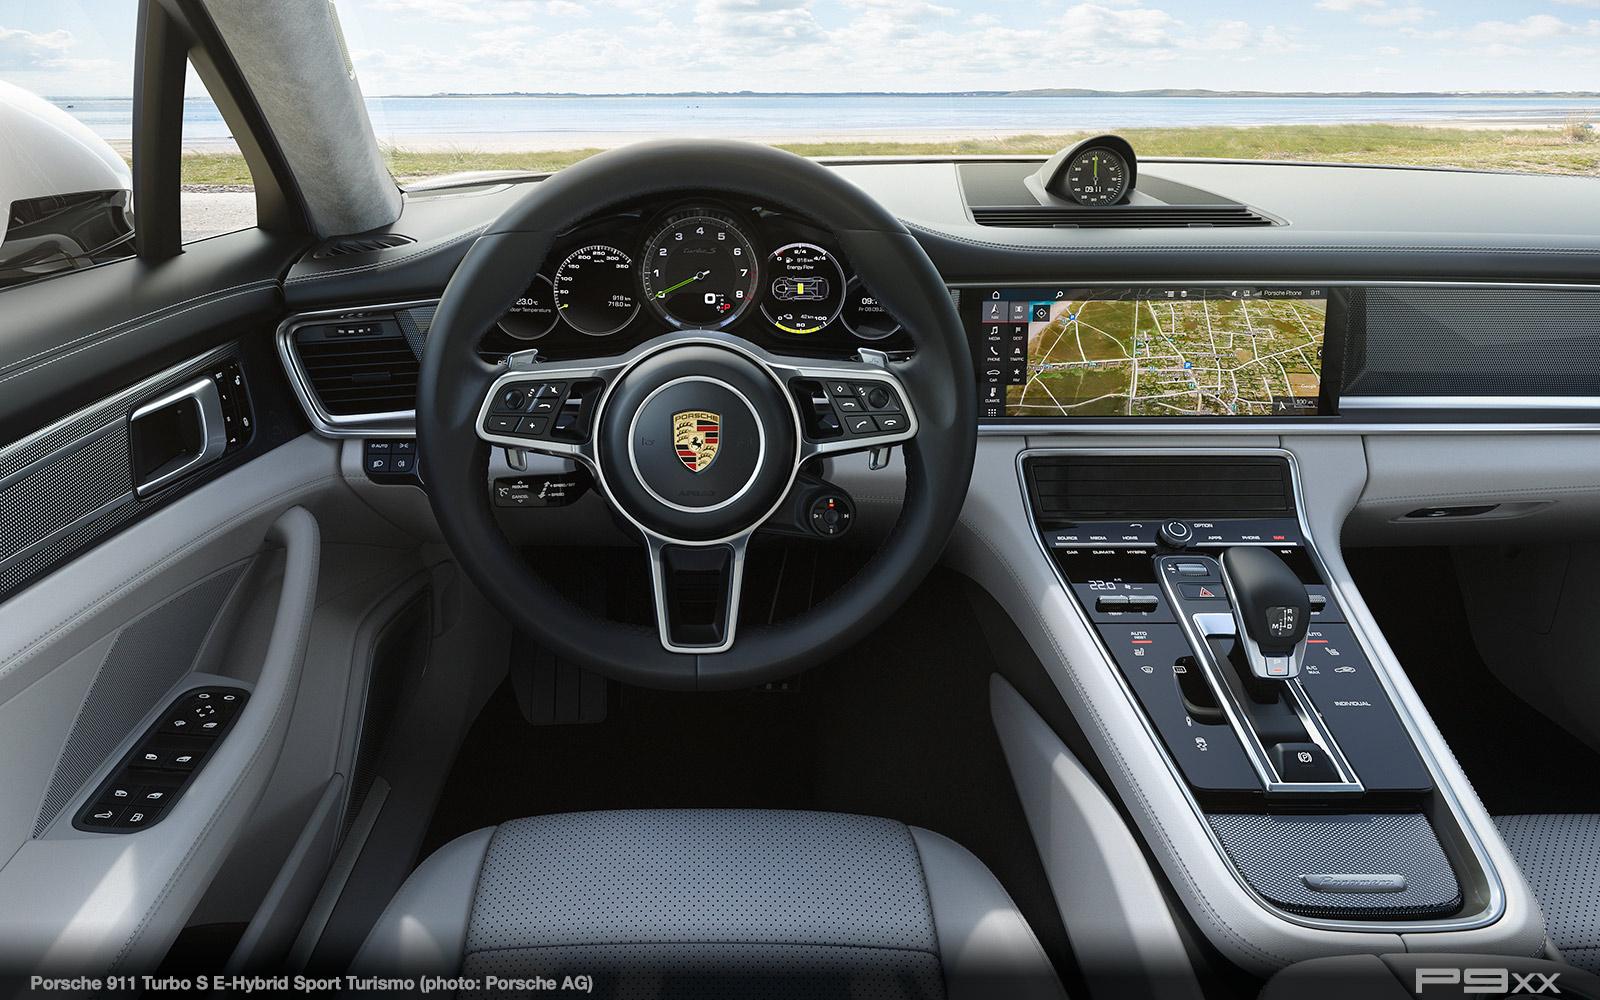 In Detail Panamera Turbo S EHybrid Sport Turismo  P9XX